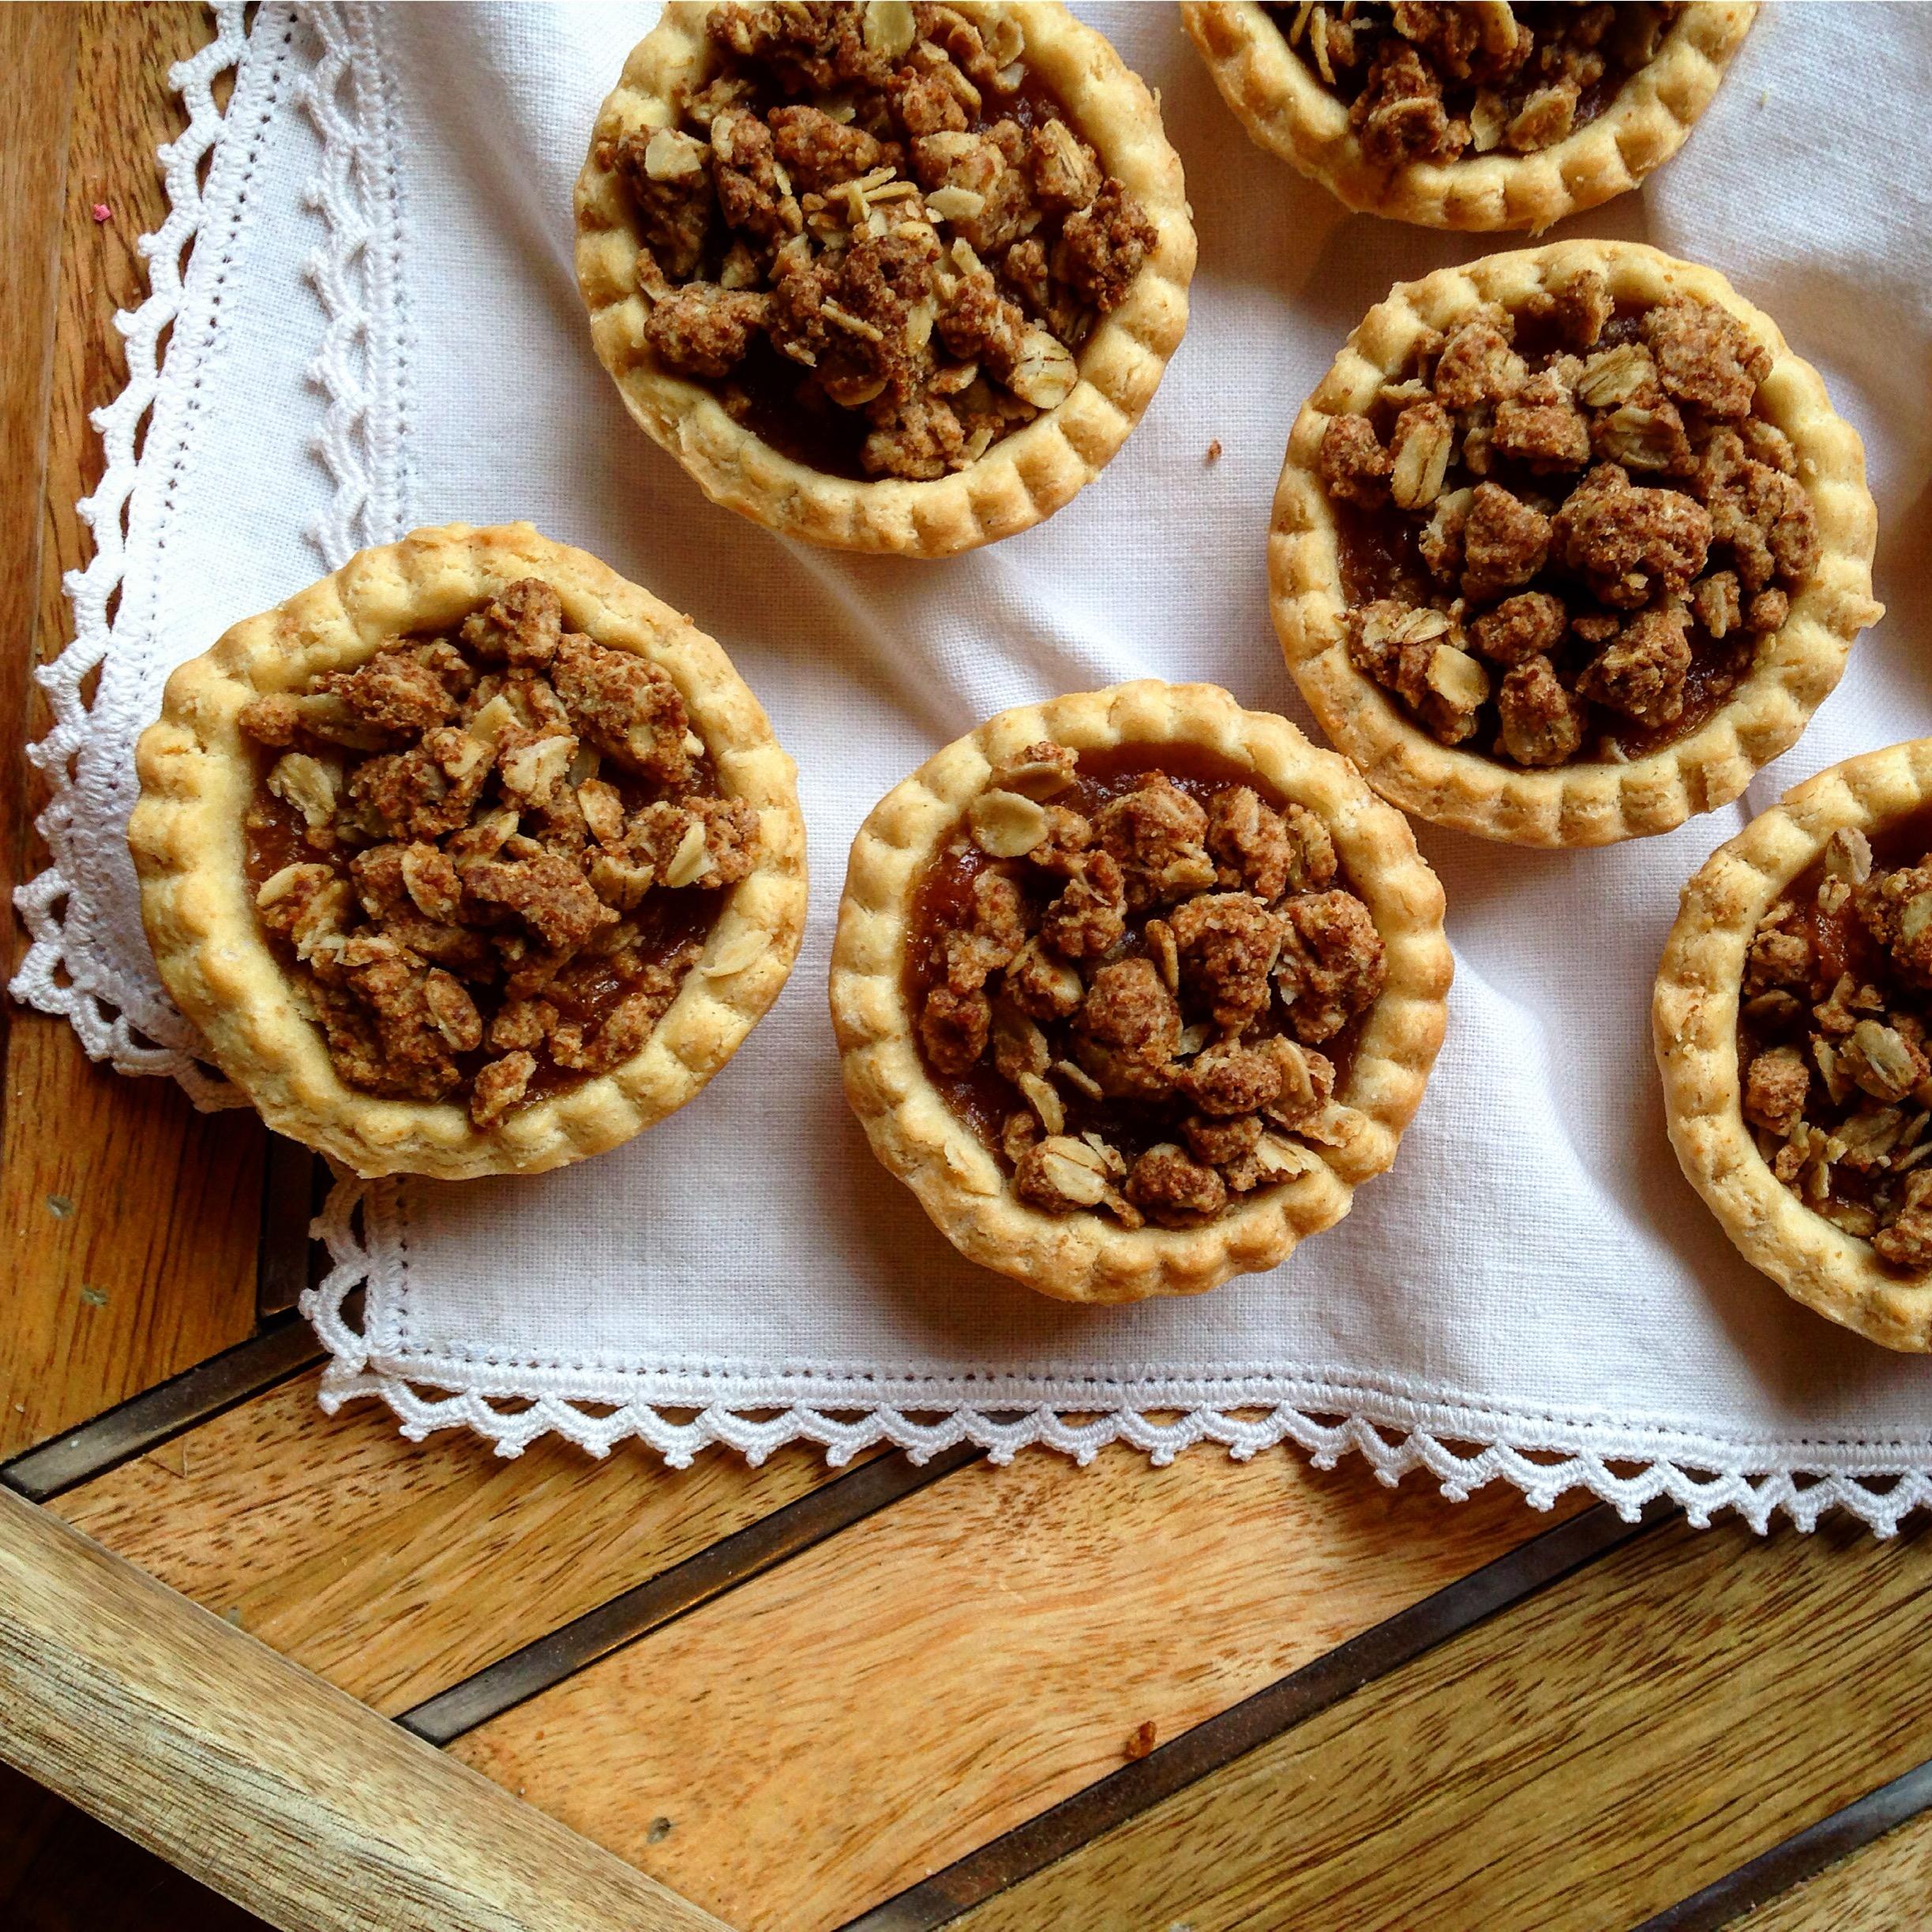 Honey Cinnamon Apple Butter Crumble Topped Mini Tarts